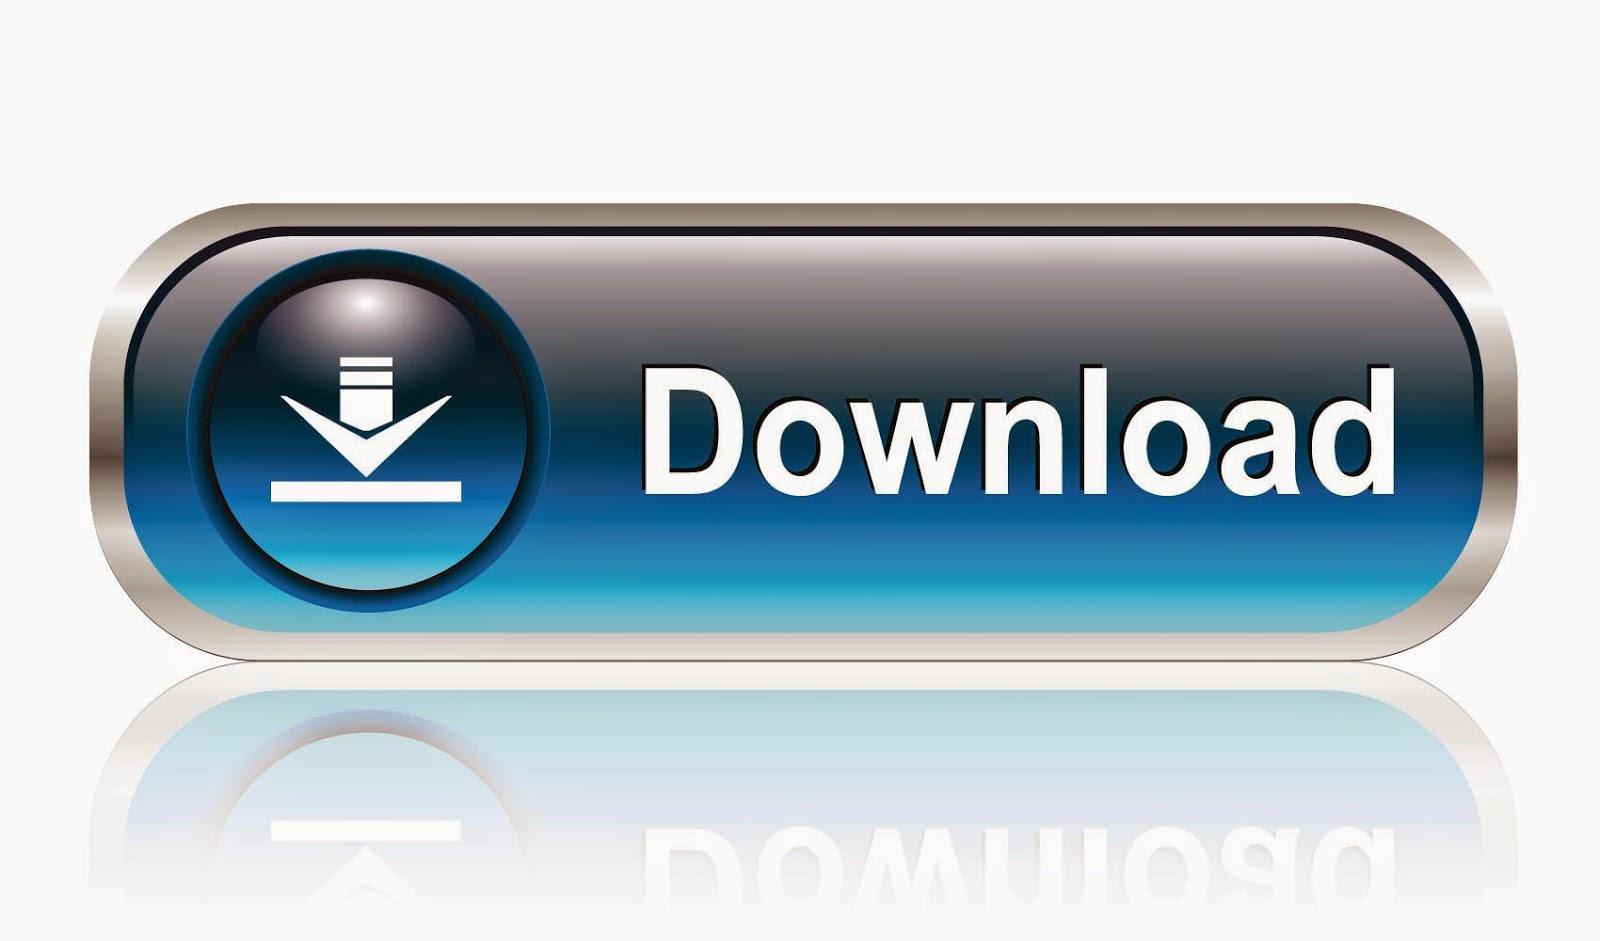 "<img src=""http://4.bp.blogspot.com/-VfLtO4A7FWQ/U2f0CeCIfnI/AAAAAAAACkc/6R1ZNymnSus/s1600/FVD-Free-Video-Downloader.jpg"" alt=""Free Video Downloader Apk Free Download"" />"